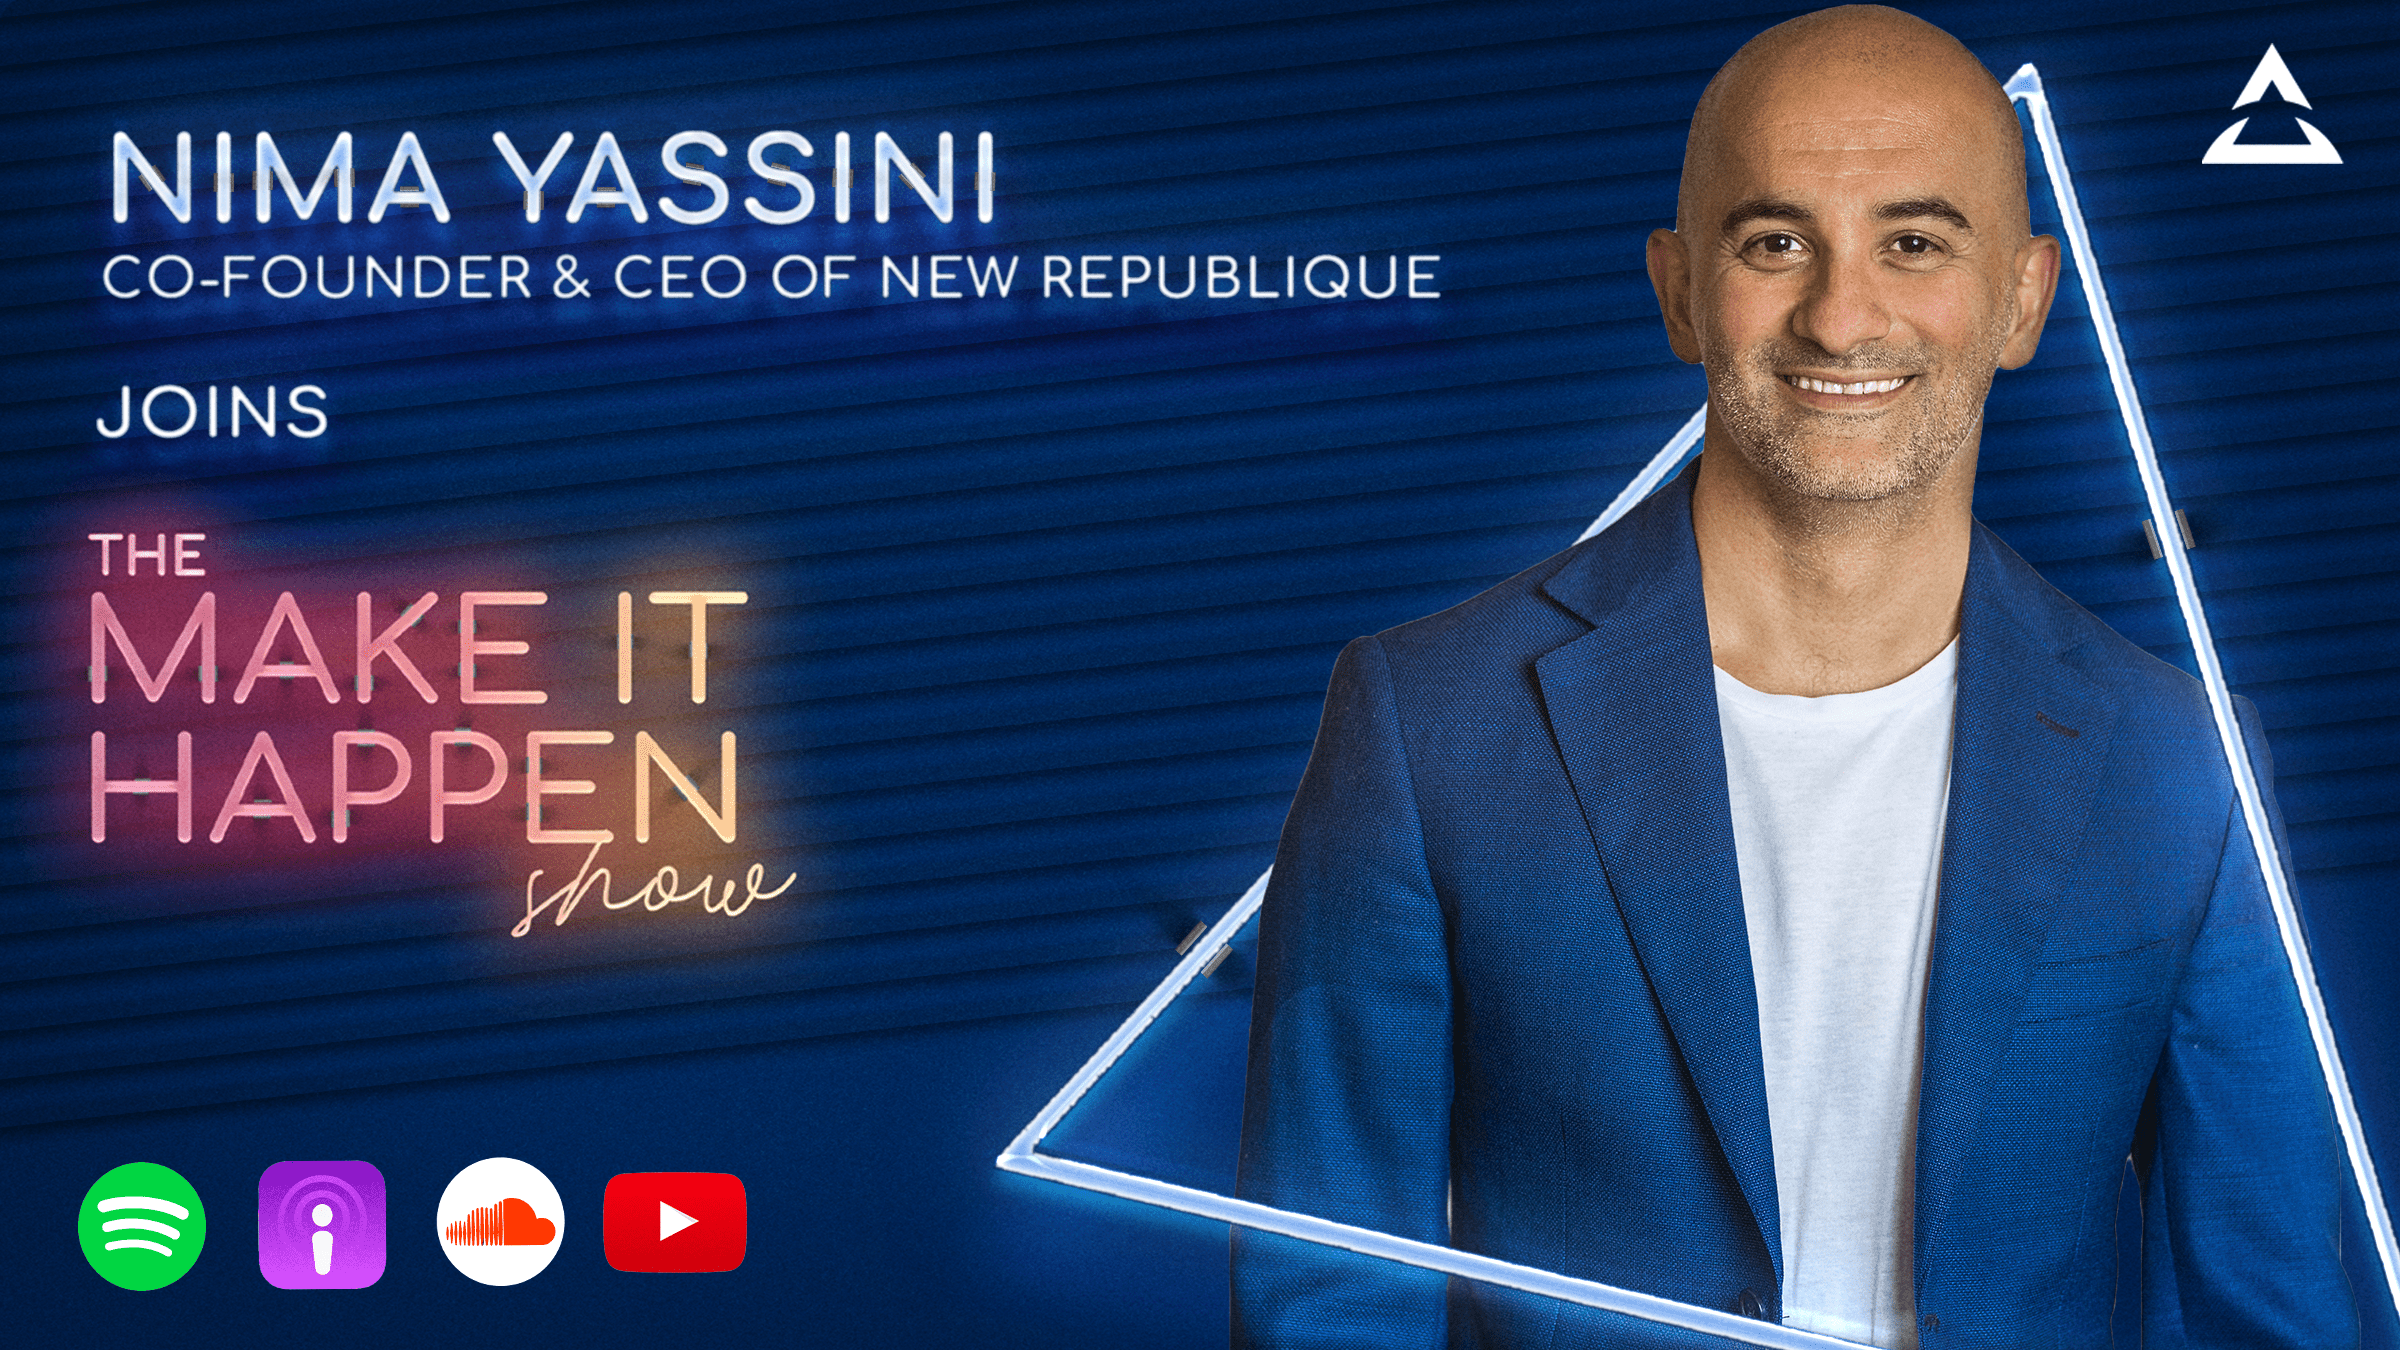 14. Nima Yassini promotional image for The Make It Happen Show